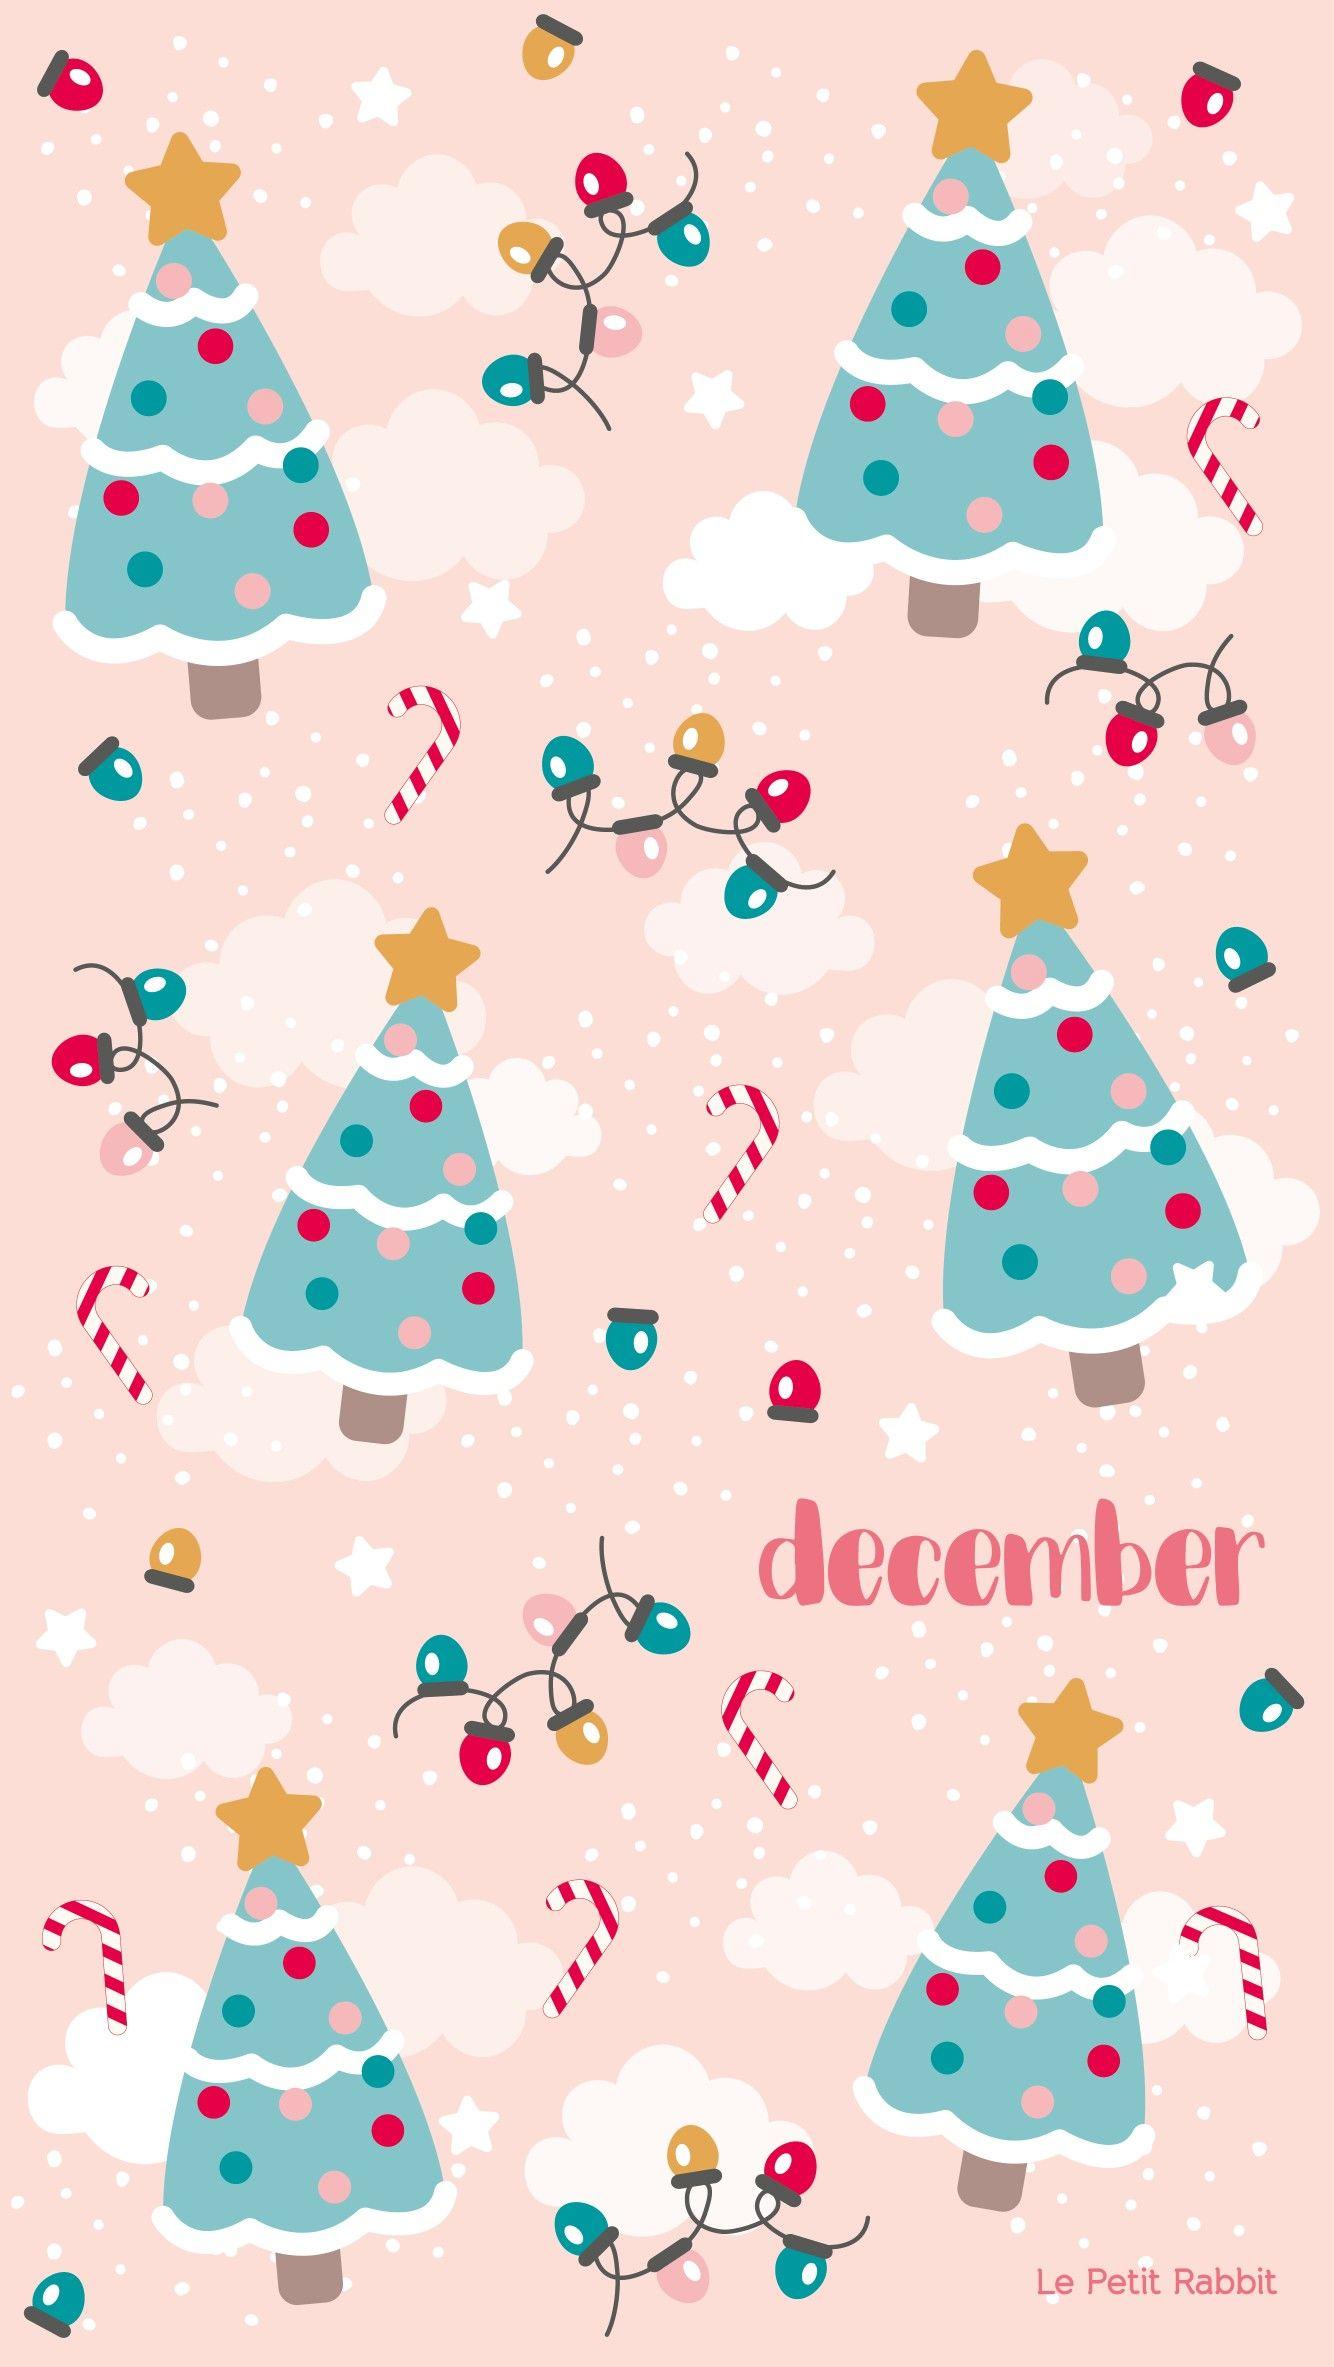 Pin By Casey Embert On Beautiful Wallpaper Christmas Phone Wallpaper Wallpaper Iphone Christmas Cute Christmas Wallpaper